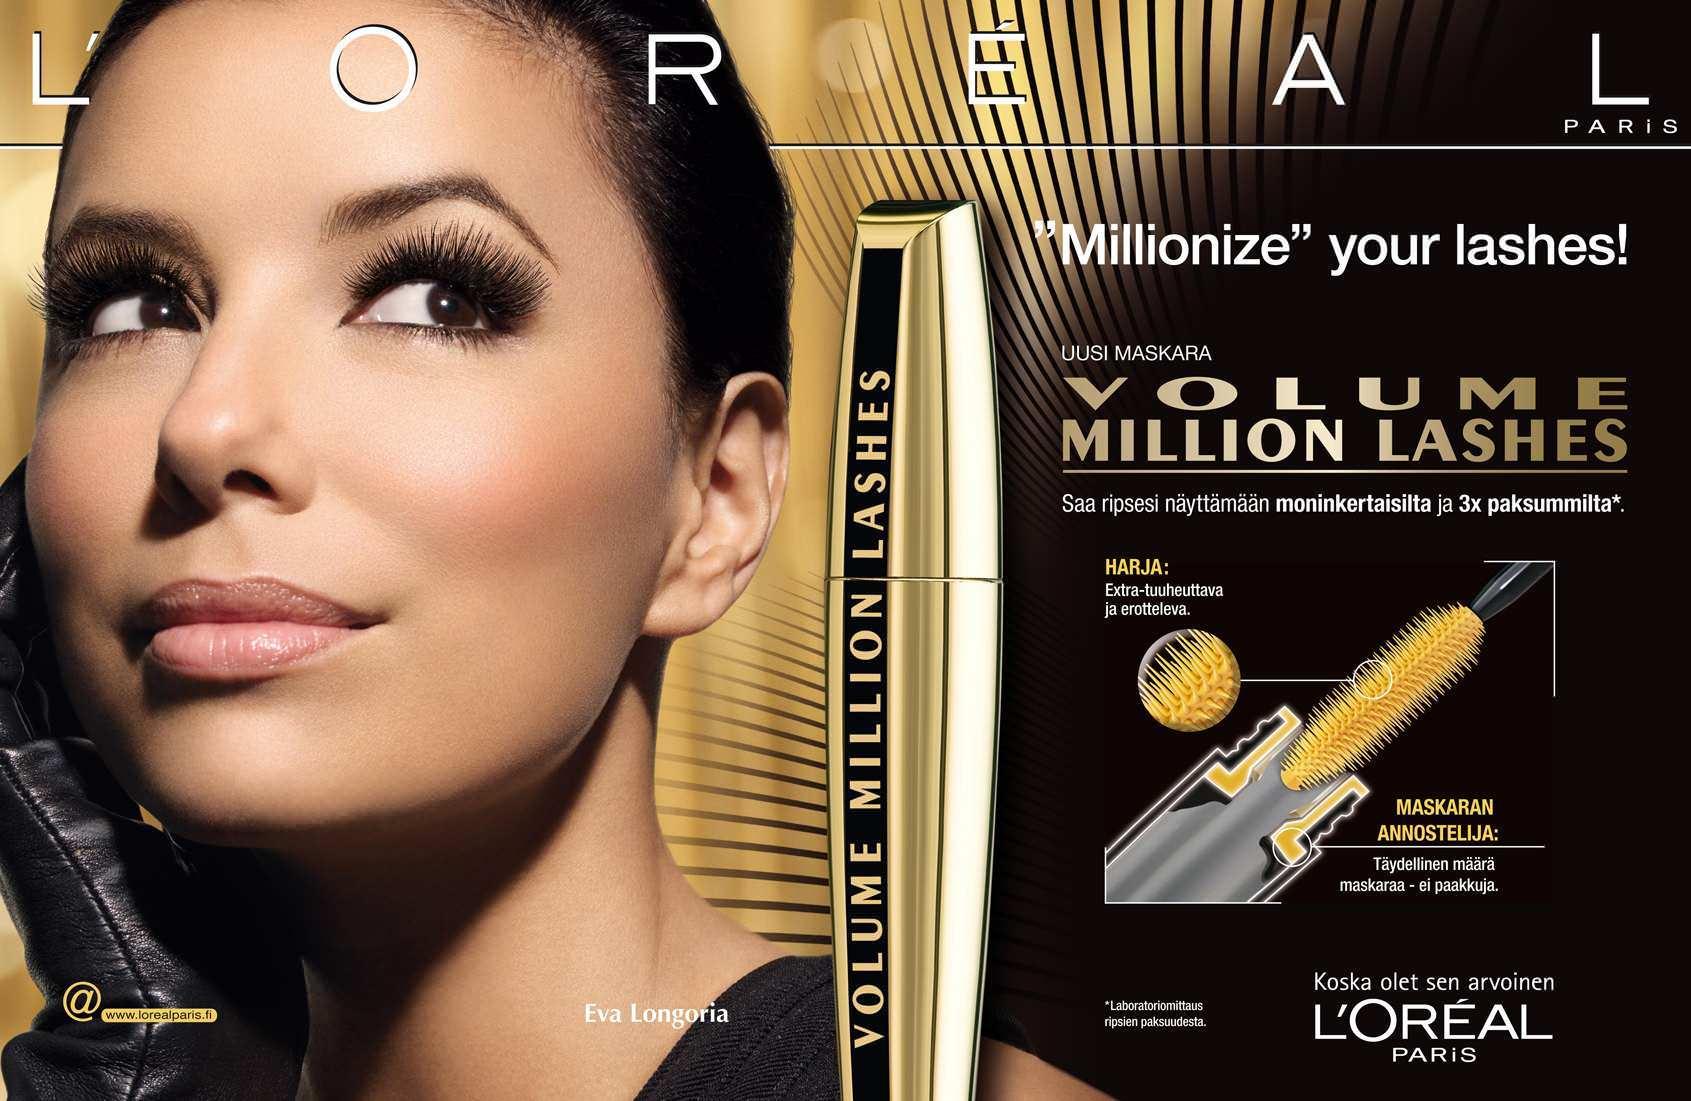 LOREAL-MASKARA-VOLUME-MILLION-LASHES_slika_O_3606736